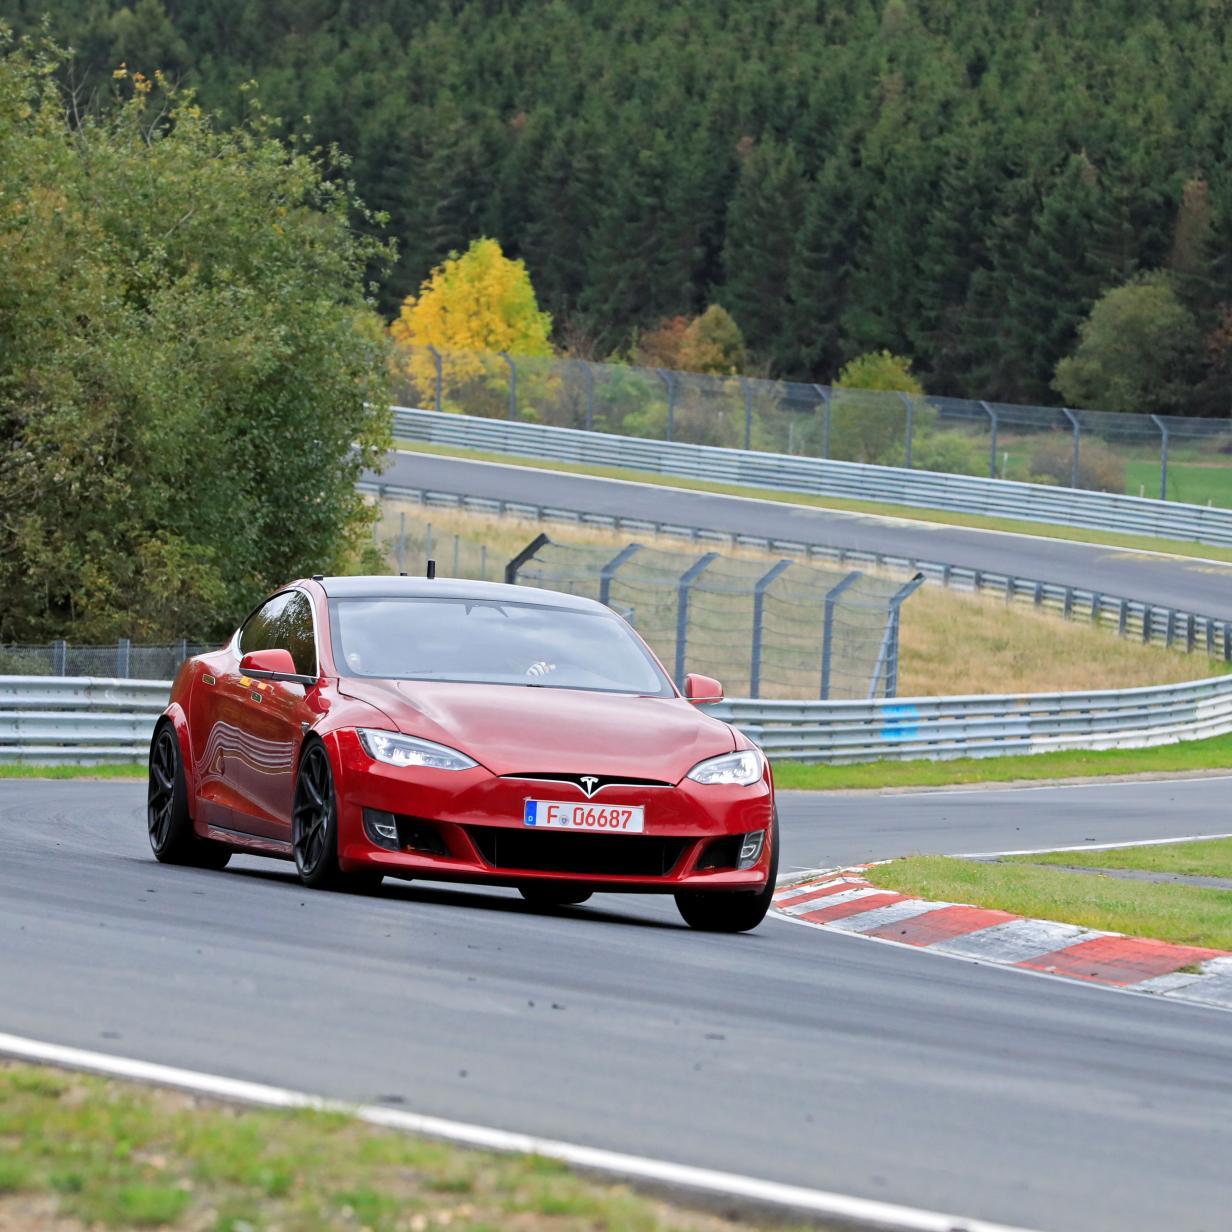 Tesla-Prototyp crasht am Nürburgring auf Rekordjagd